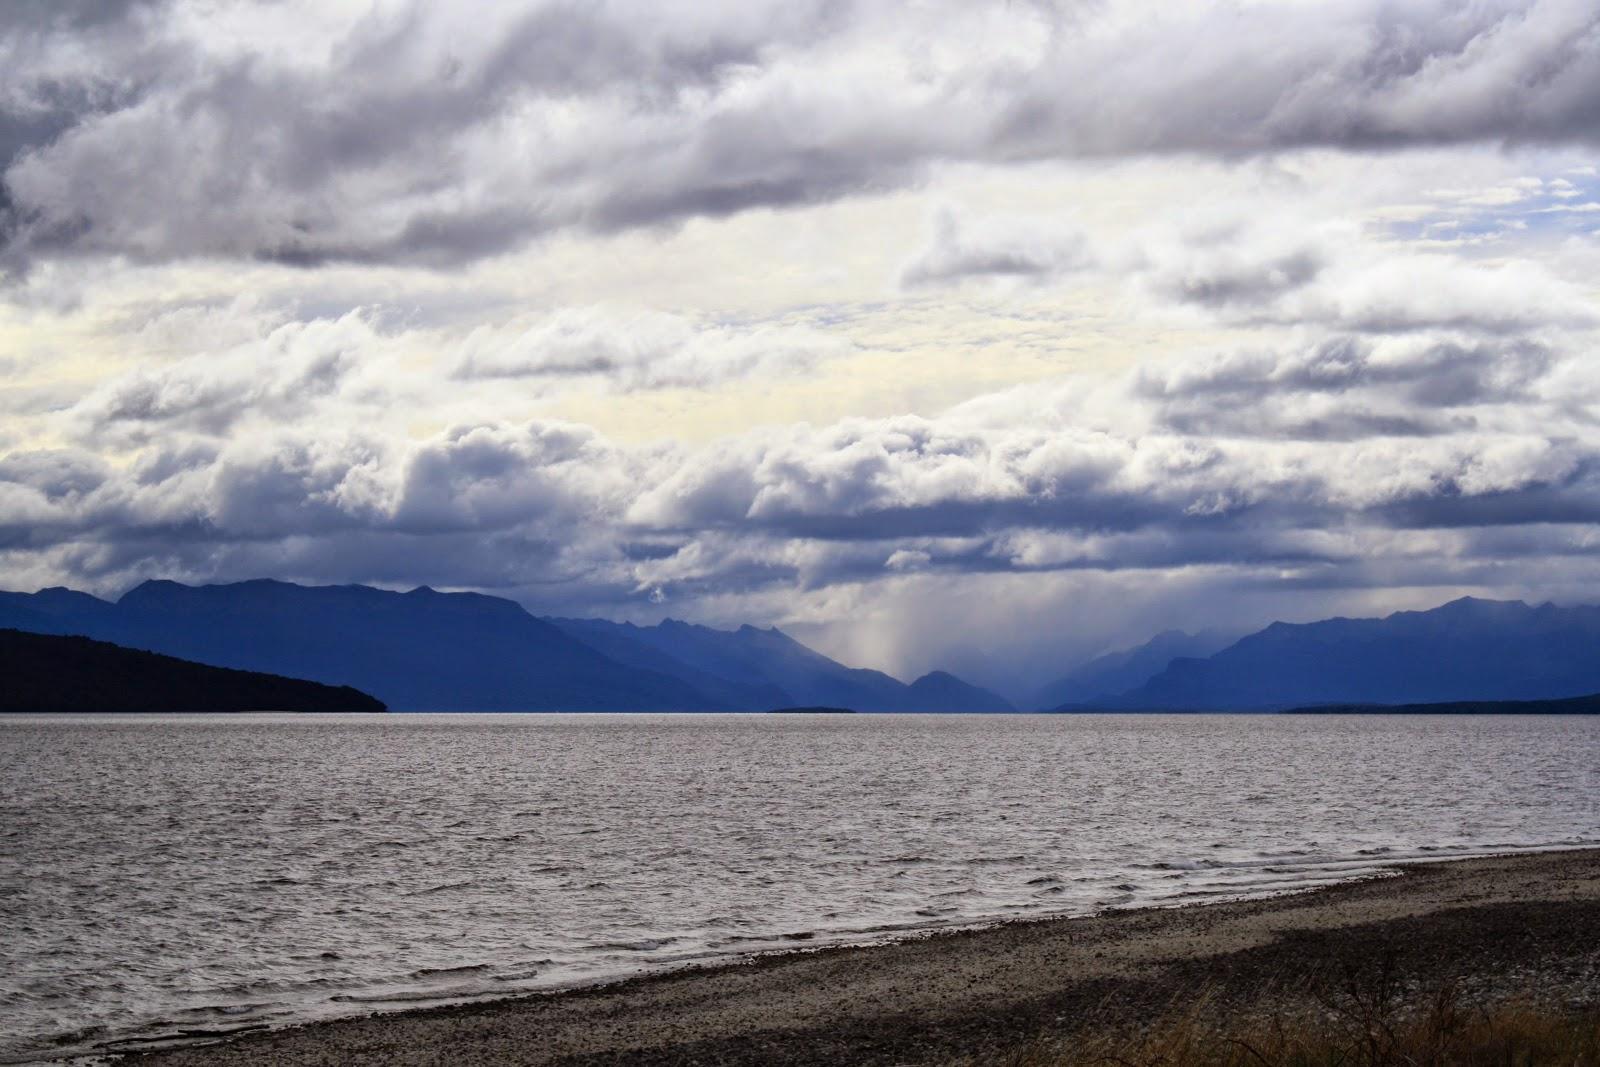 Lake Te Anau, looking cold and grey.